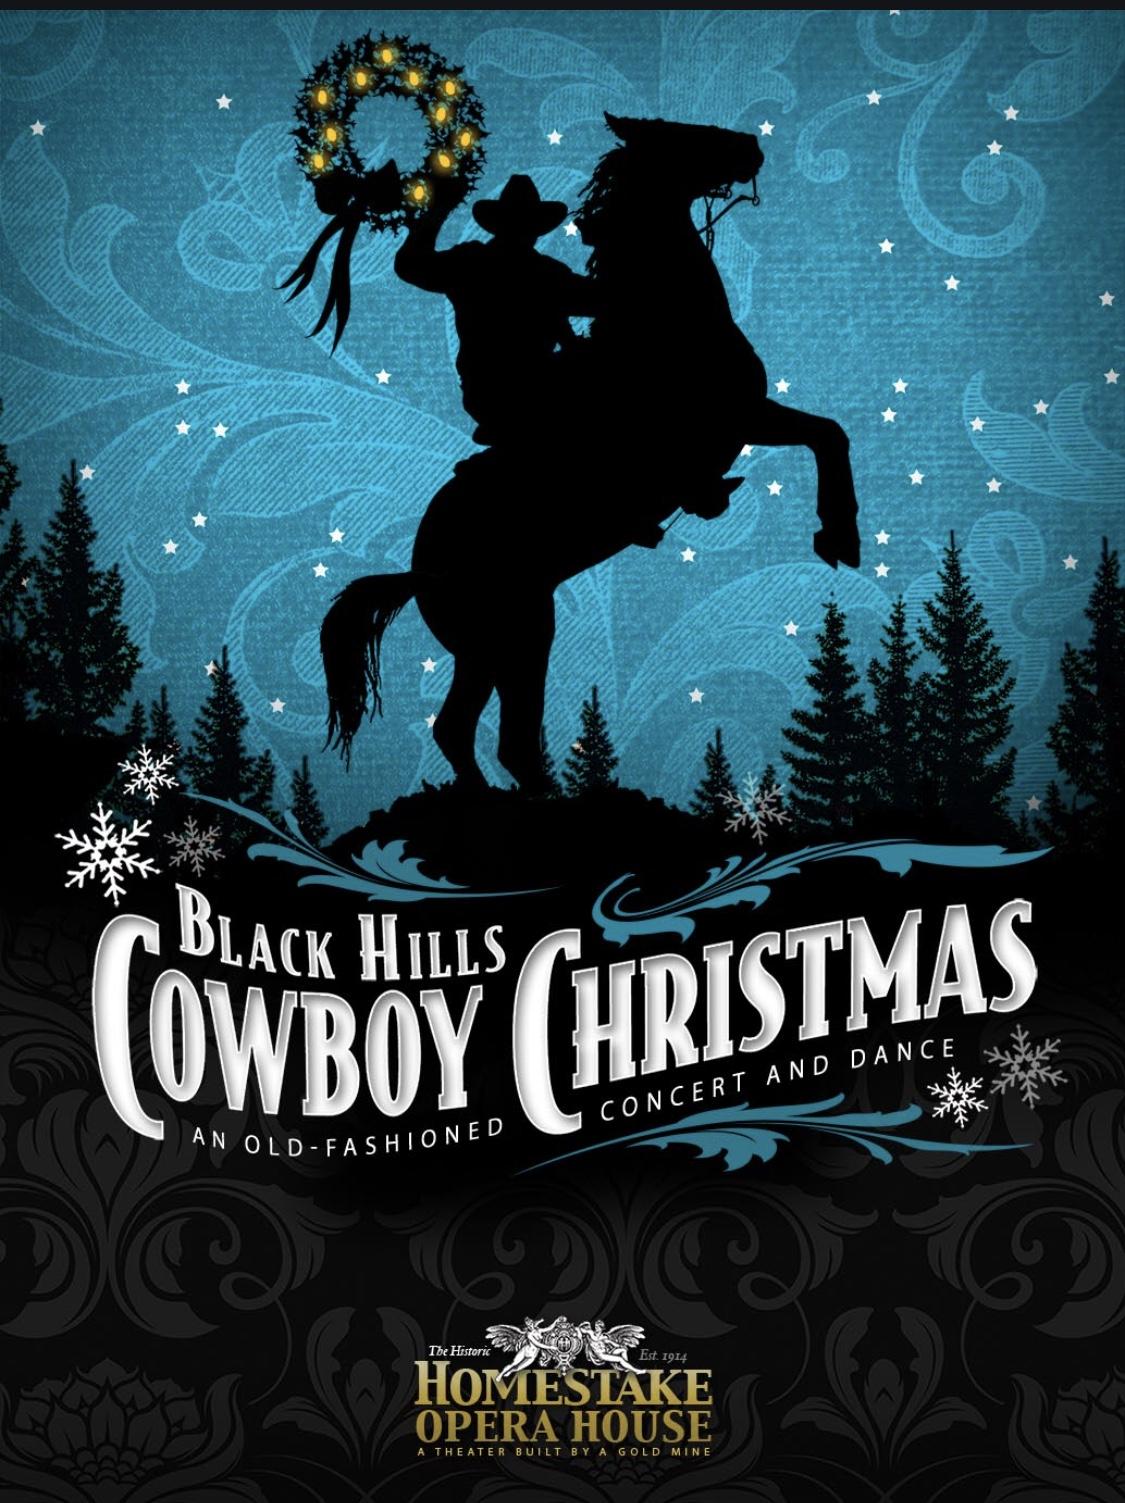 Christmas Concerts.Black Hills Cowboy Christmas It S The 10th Year Of The Black Hills Cowboy Christmas Concerts Dance Arts South Dakota